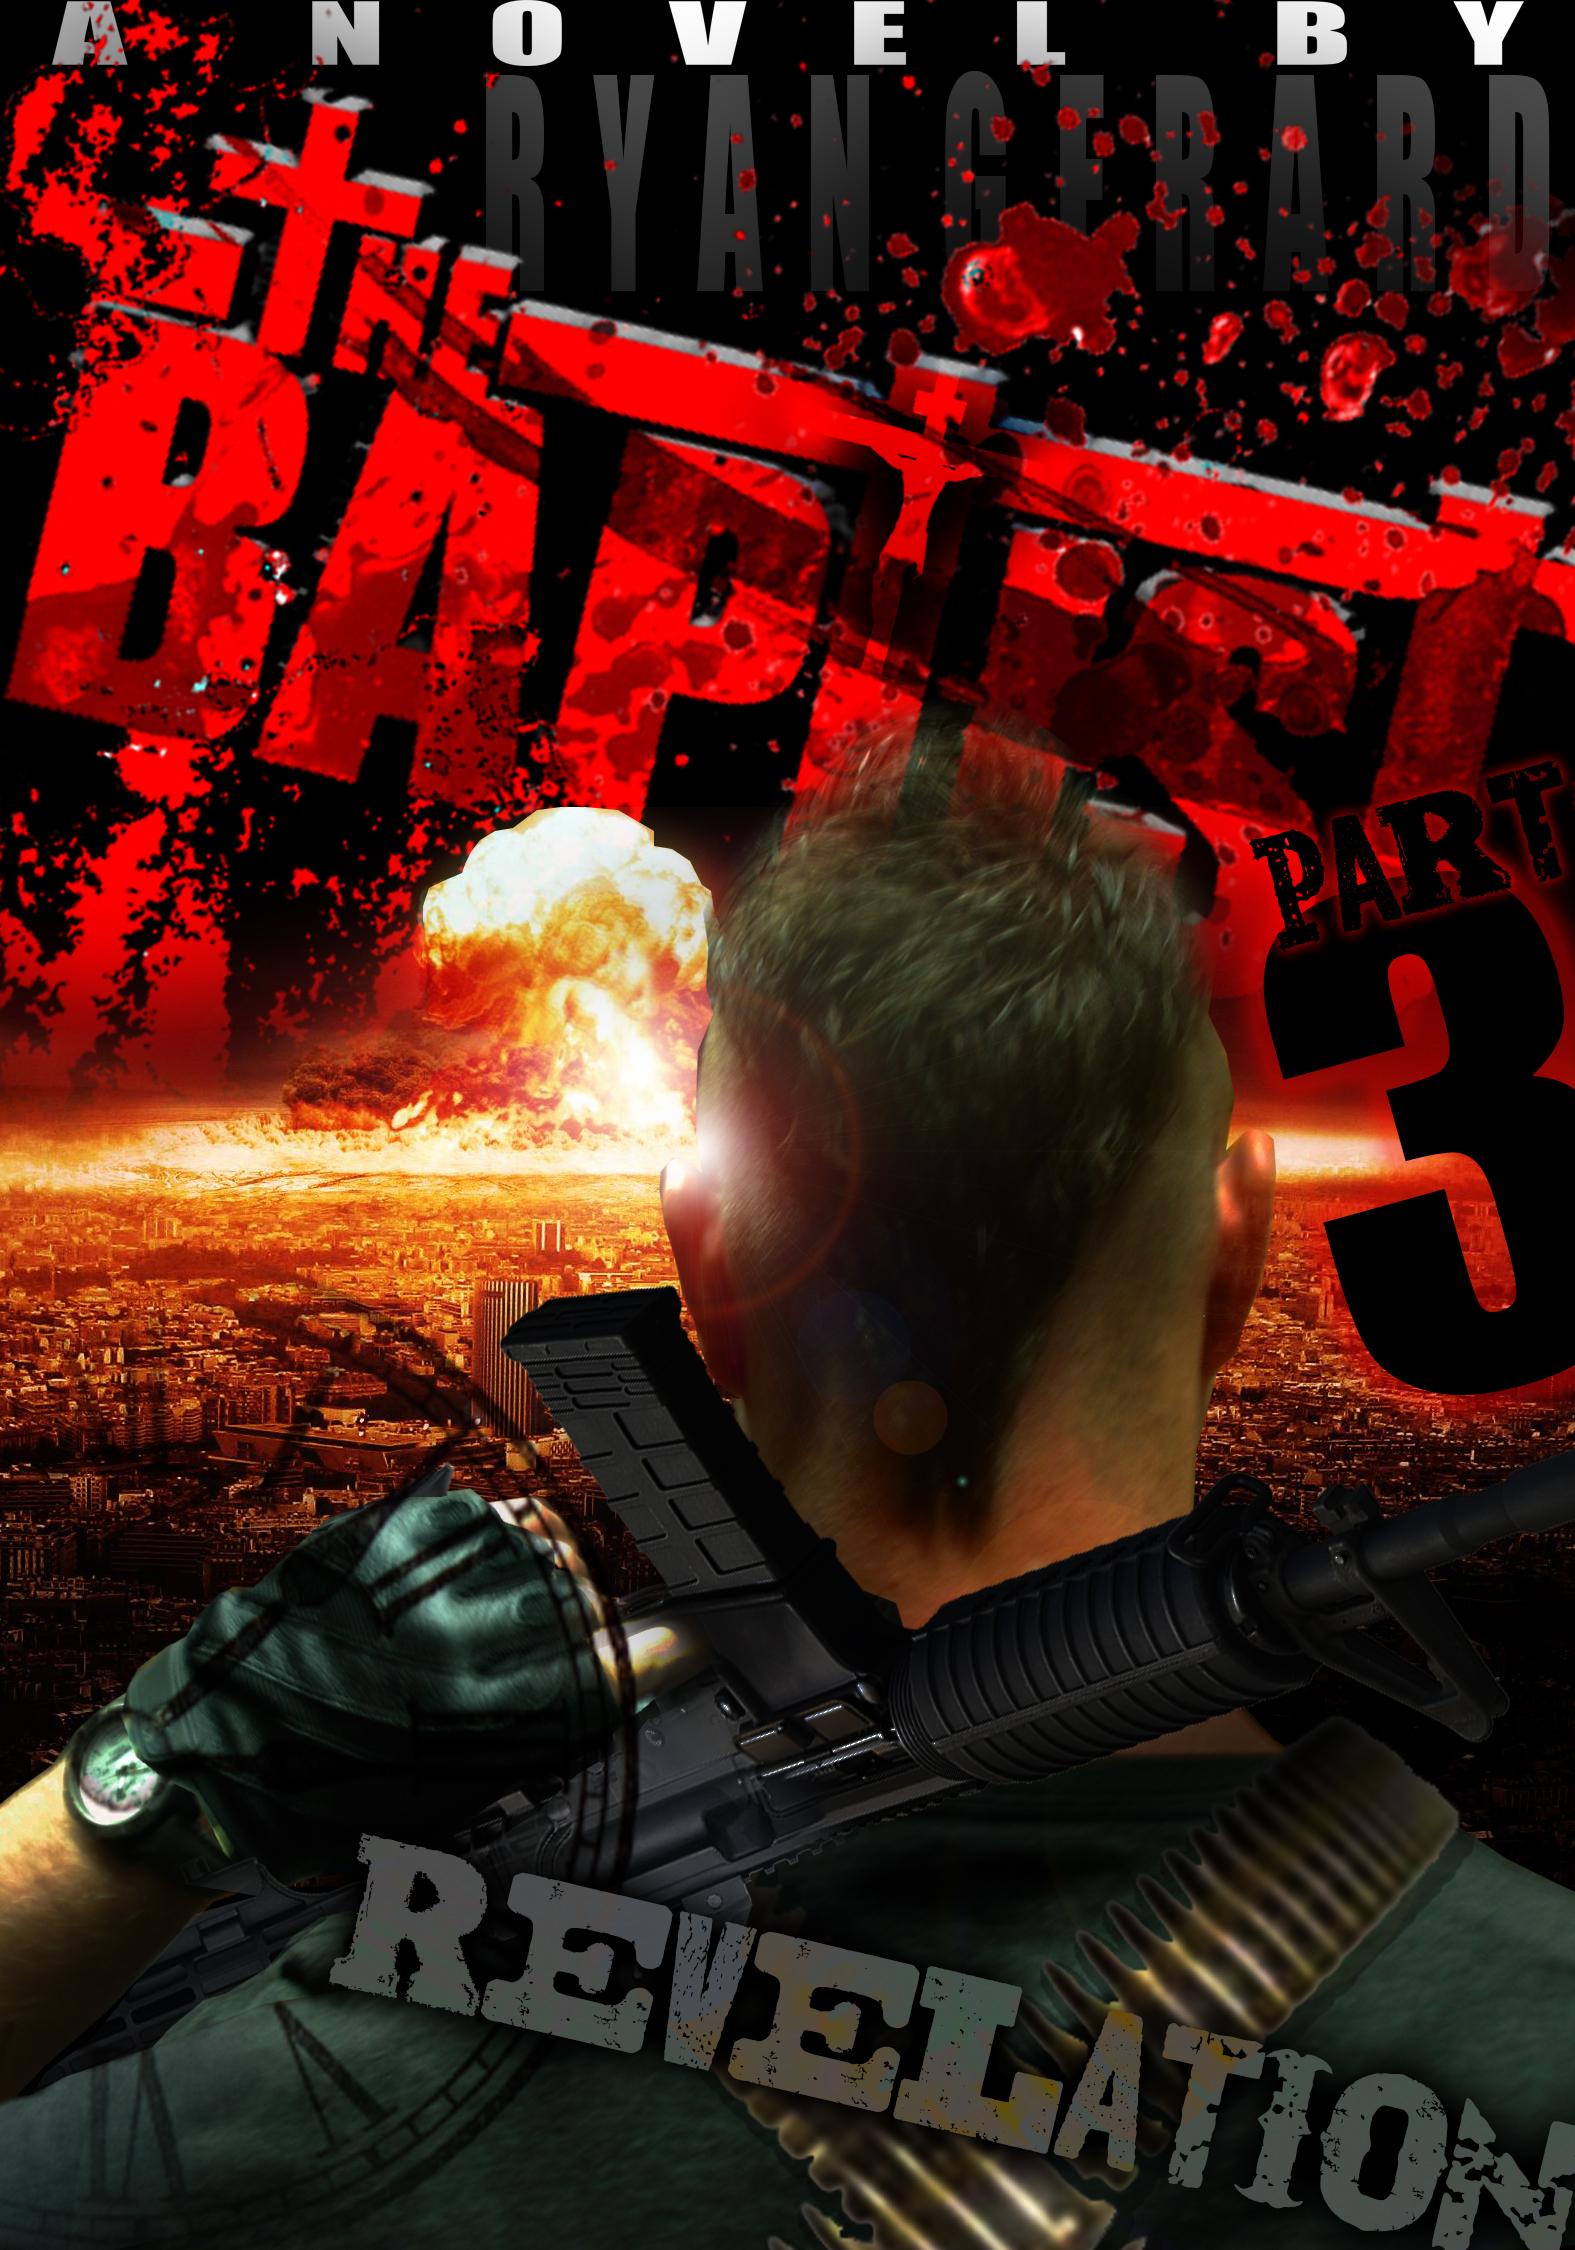 BAPTIST_PART_3_COVER